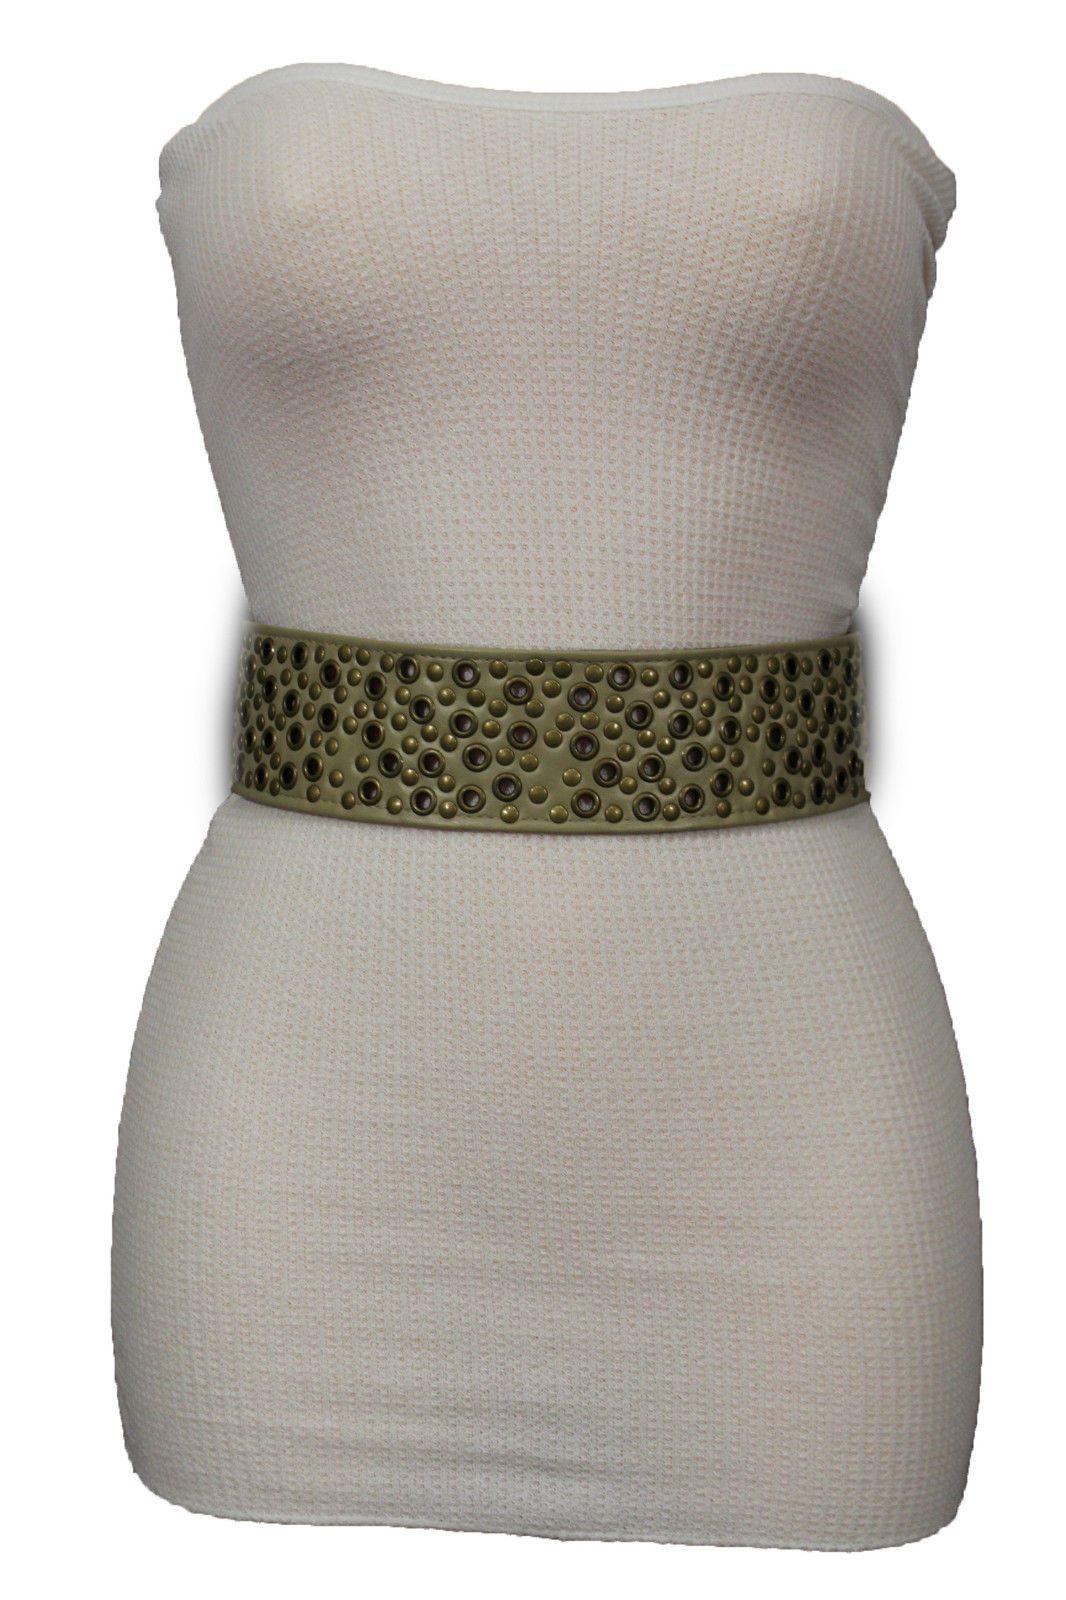 Beige Faux Leather Hip High Waist Tie Belt Multi Antique Gold Stud New Women Fashion Accessories S M L